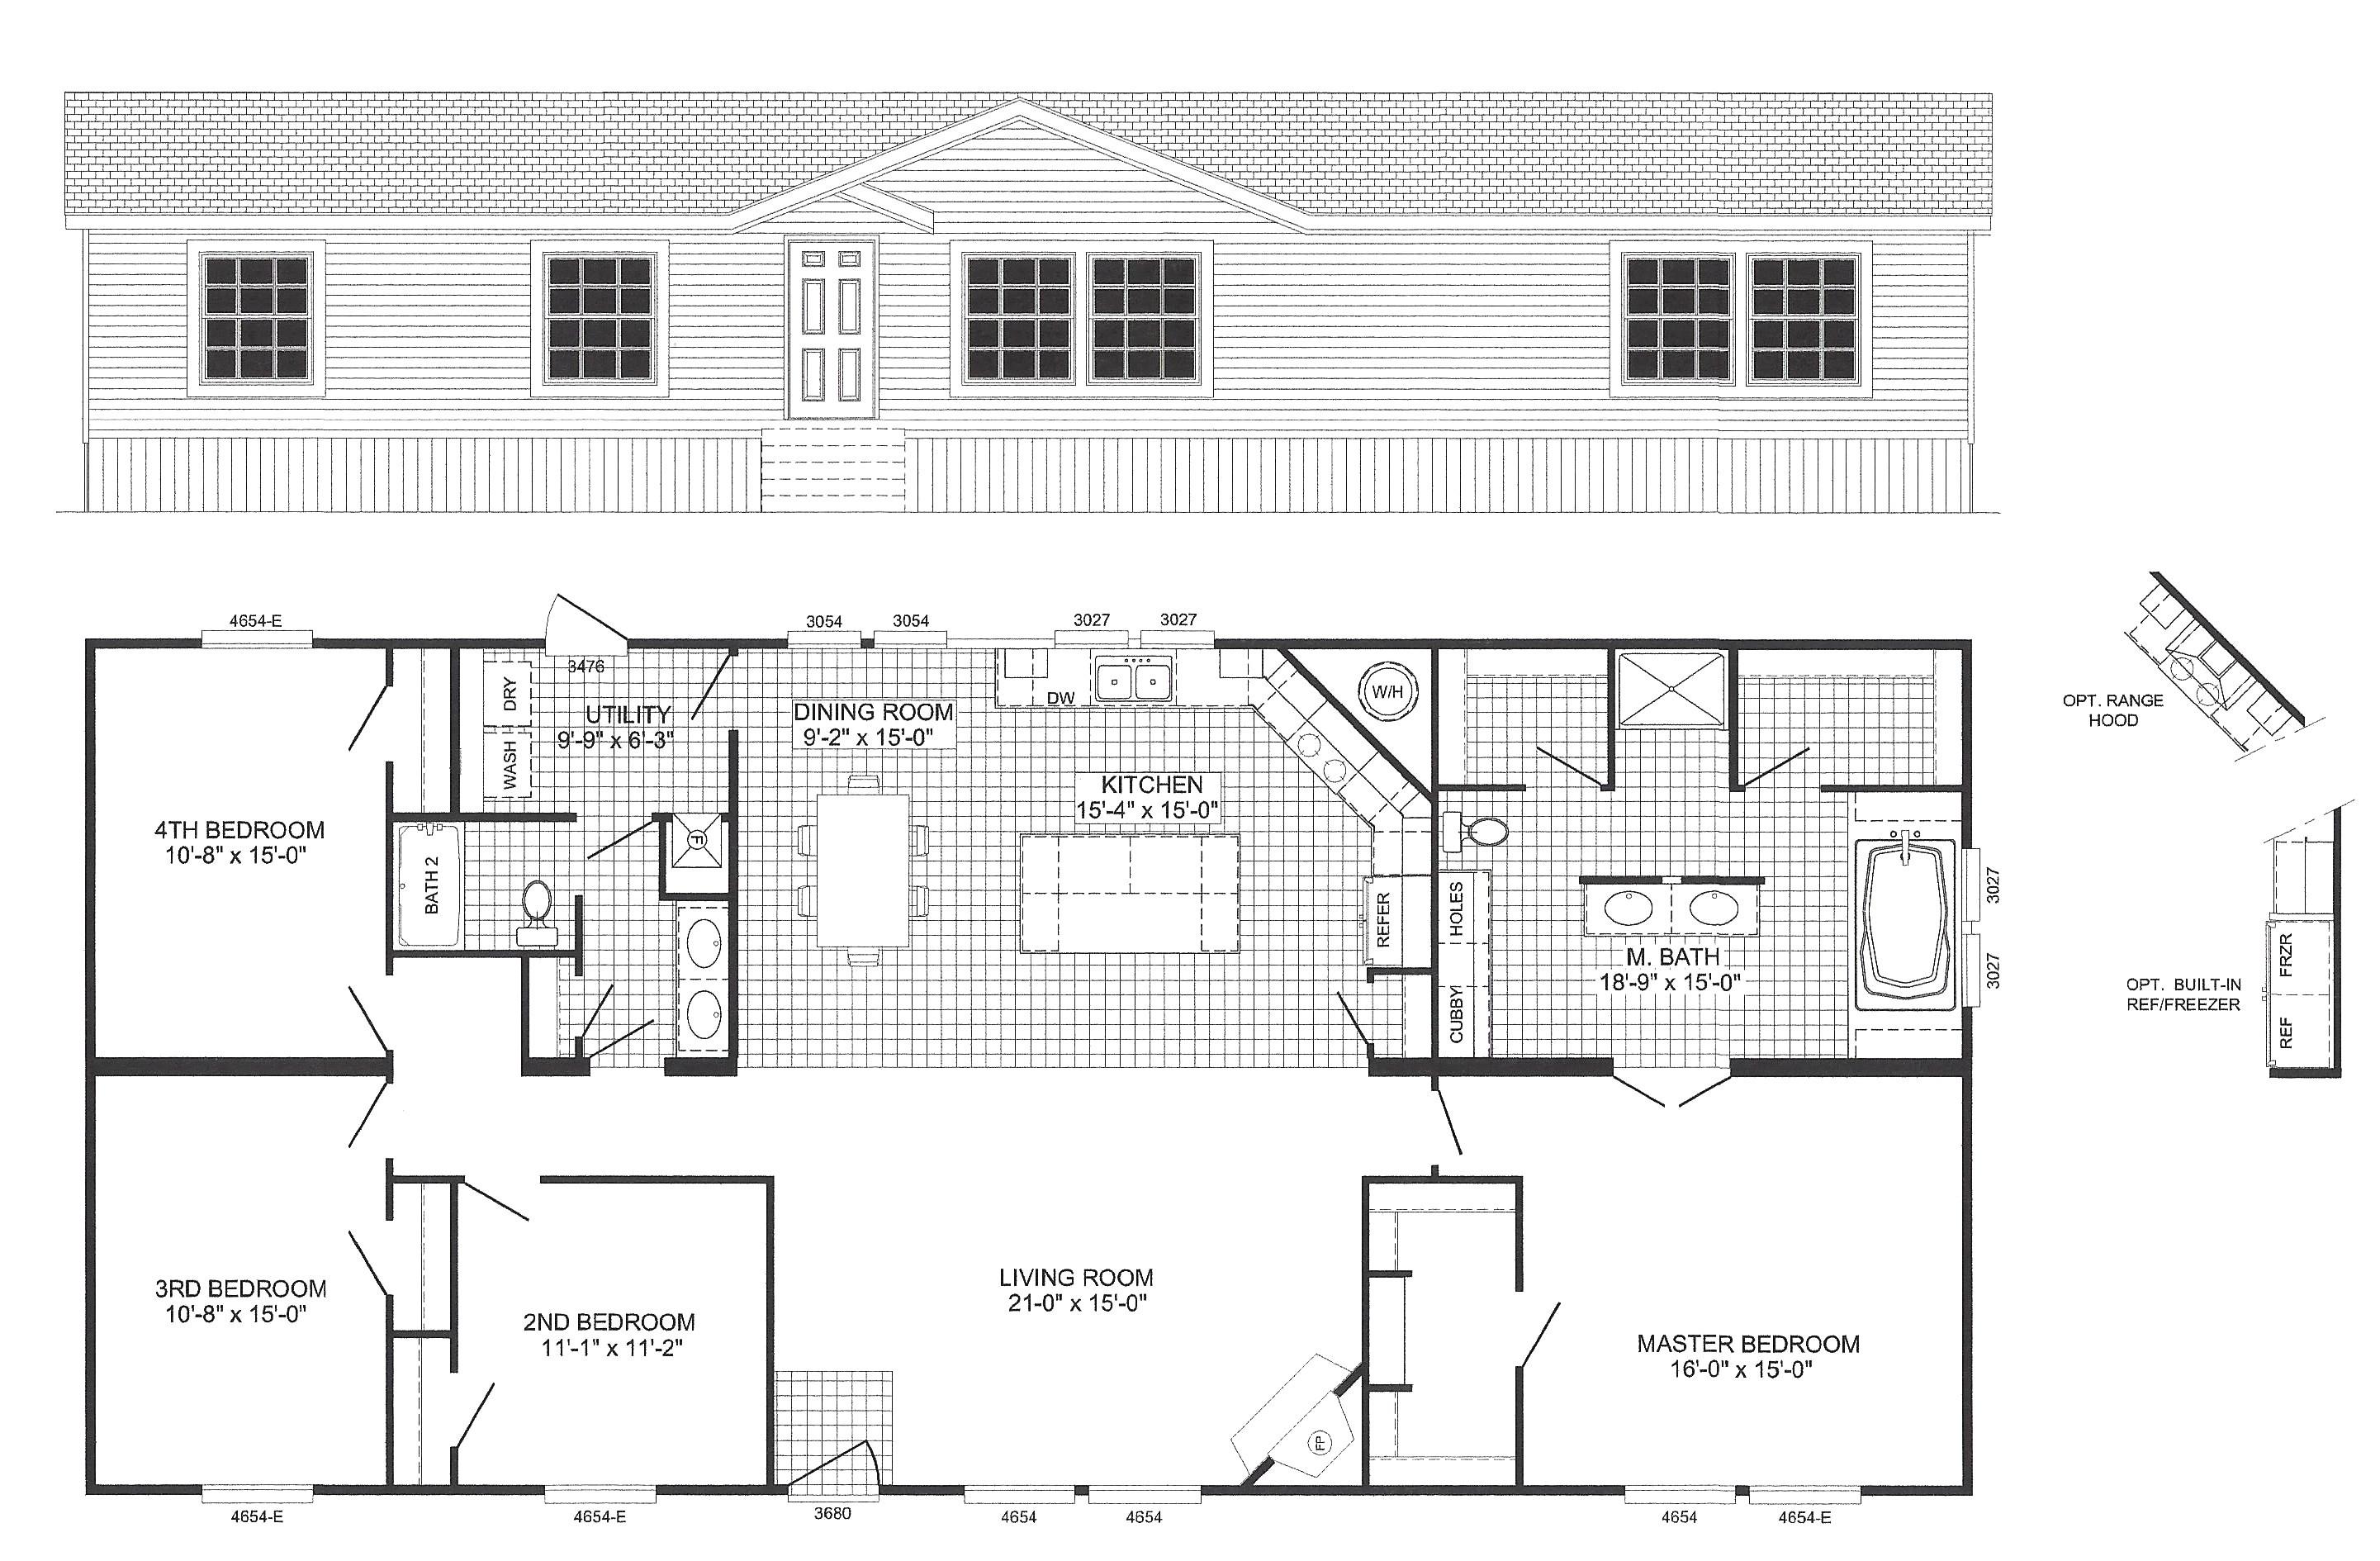 1997 fleetwood mobile home floor plan lovely 50 new hulbert homes floor plans best house plans gallery best